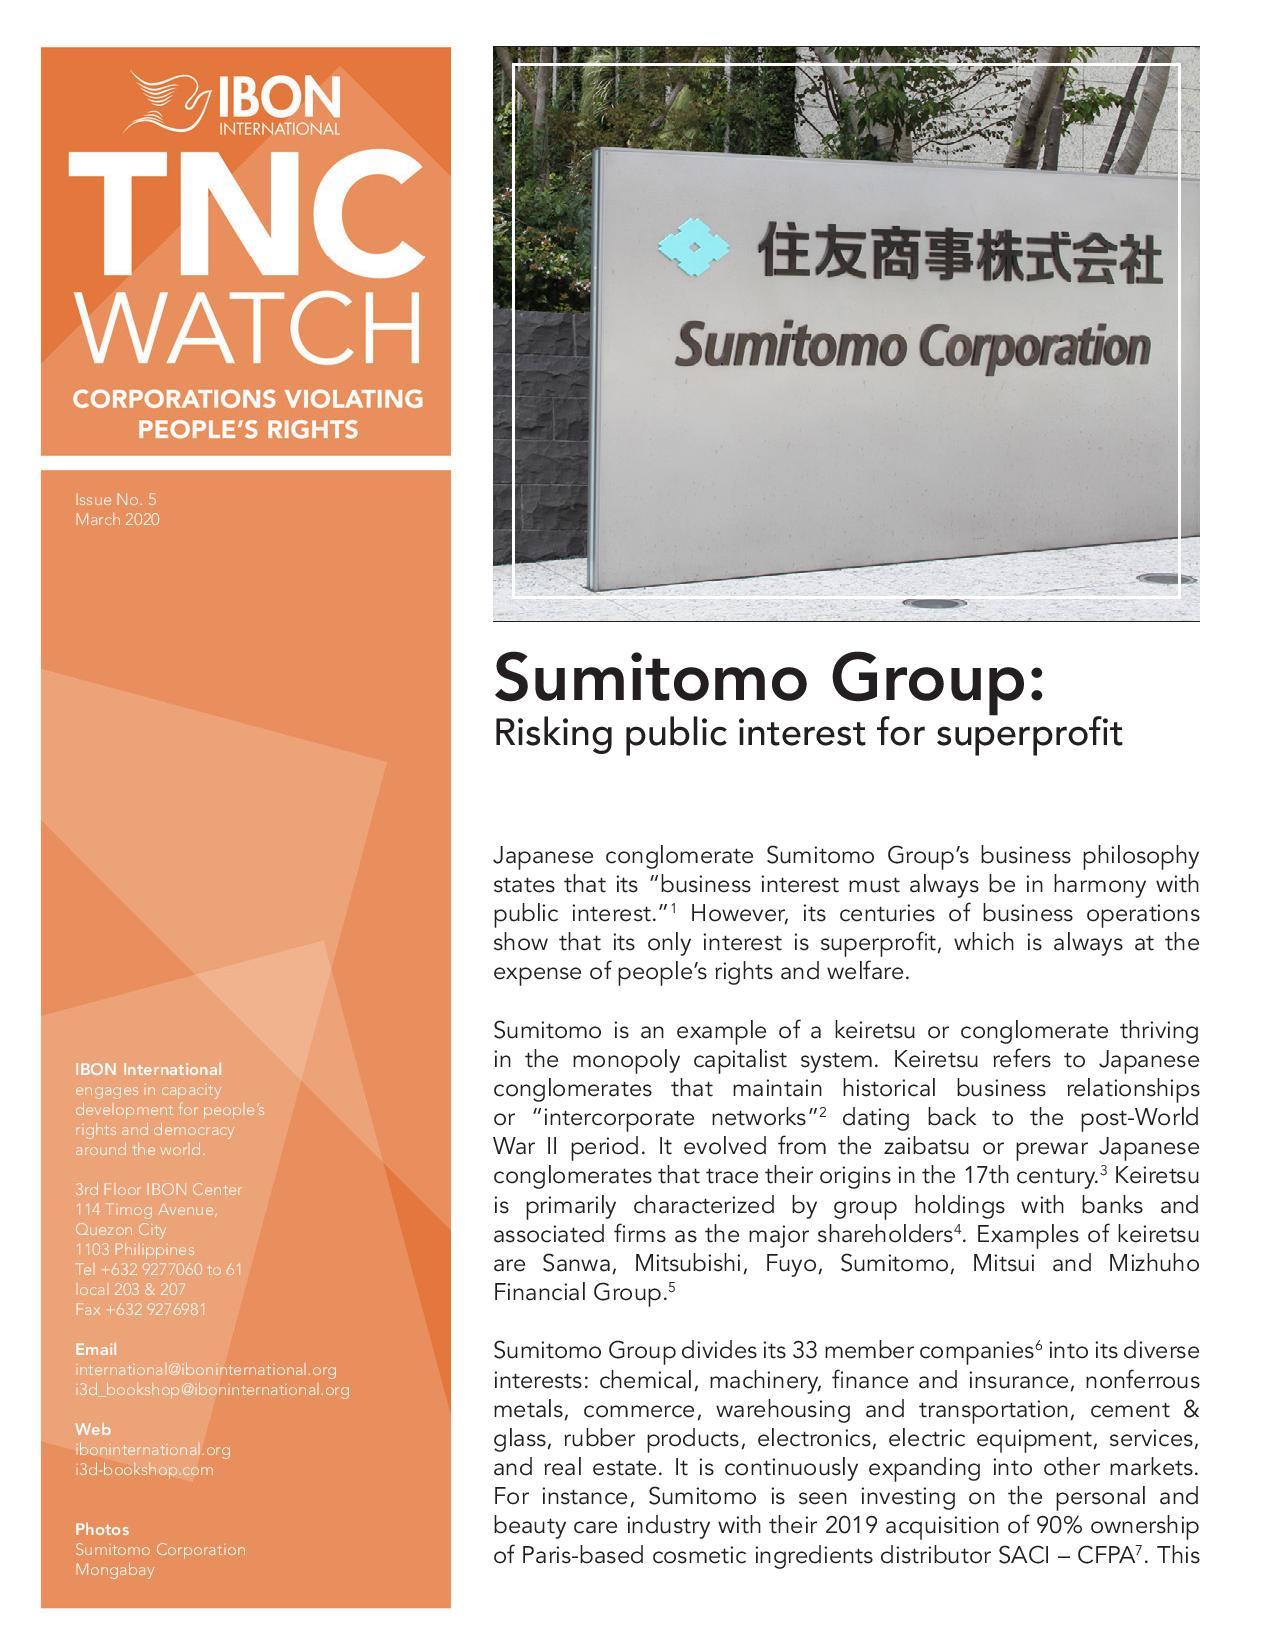 Sumitomo Group: Risking public interest for superprofit